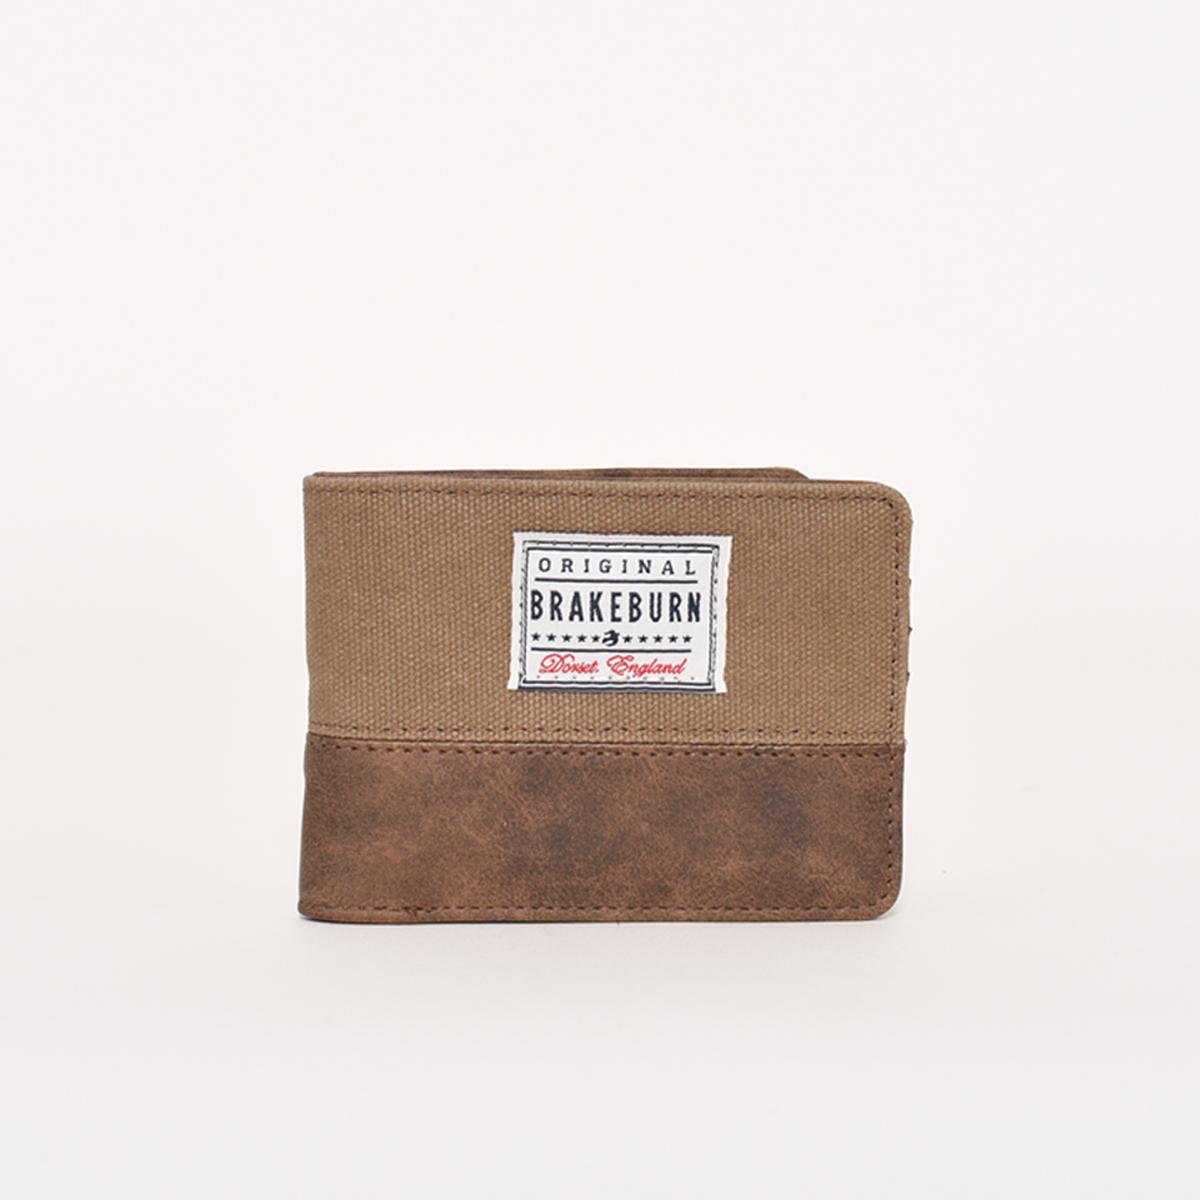 Brakeburn Wallet